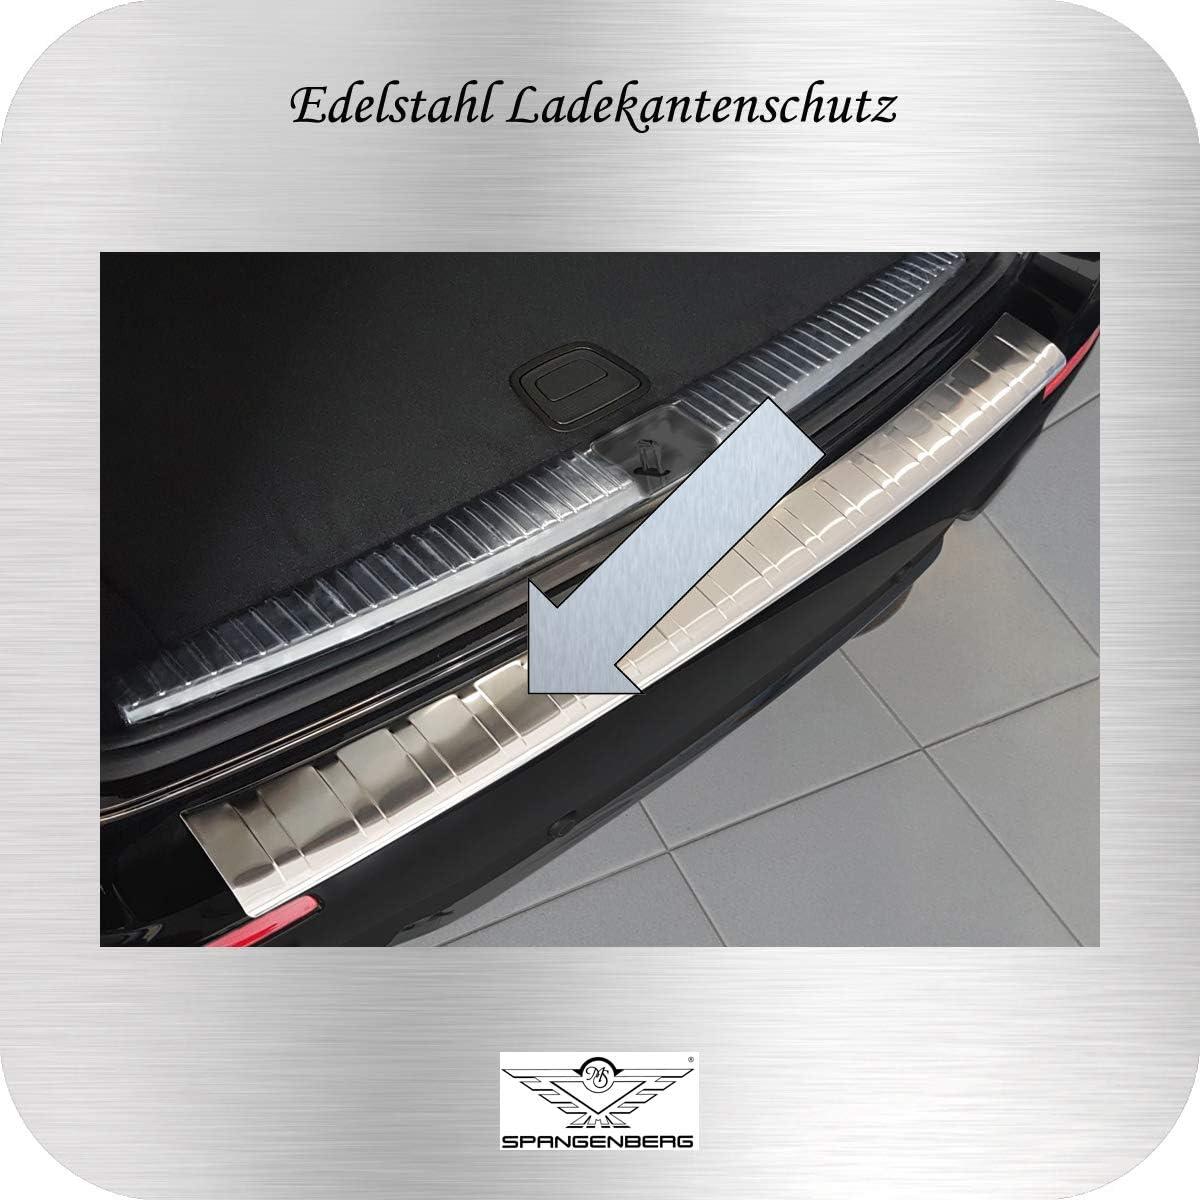 Spangenberg Edelstahl Ladekantenschutz Mercedes Benz E Klasse S213 T Modell Kombi Ab Baujahr 07 2016 T Model Art 3235812 Auto